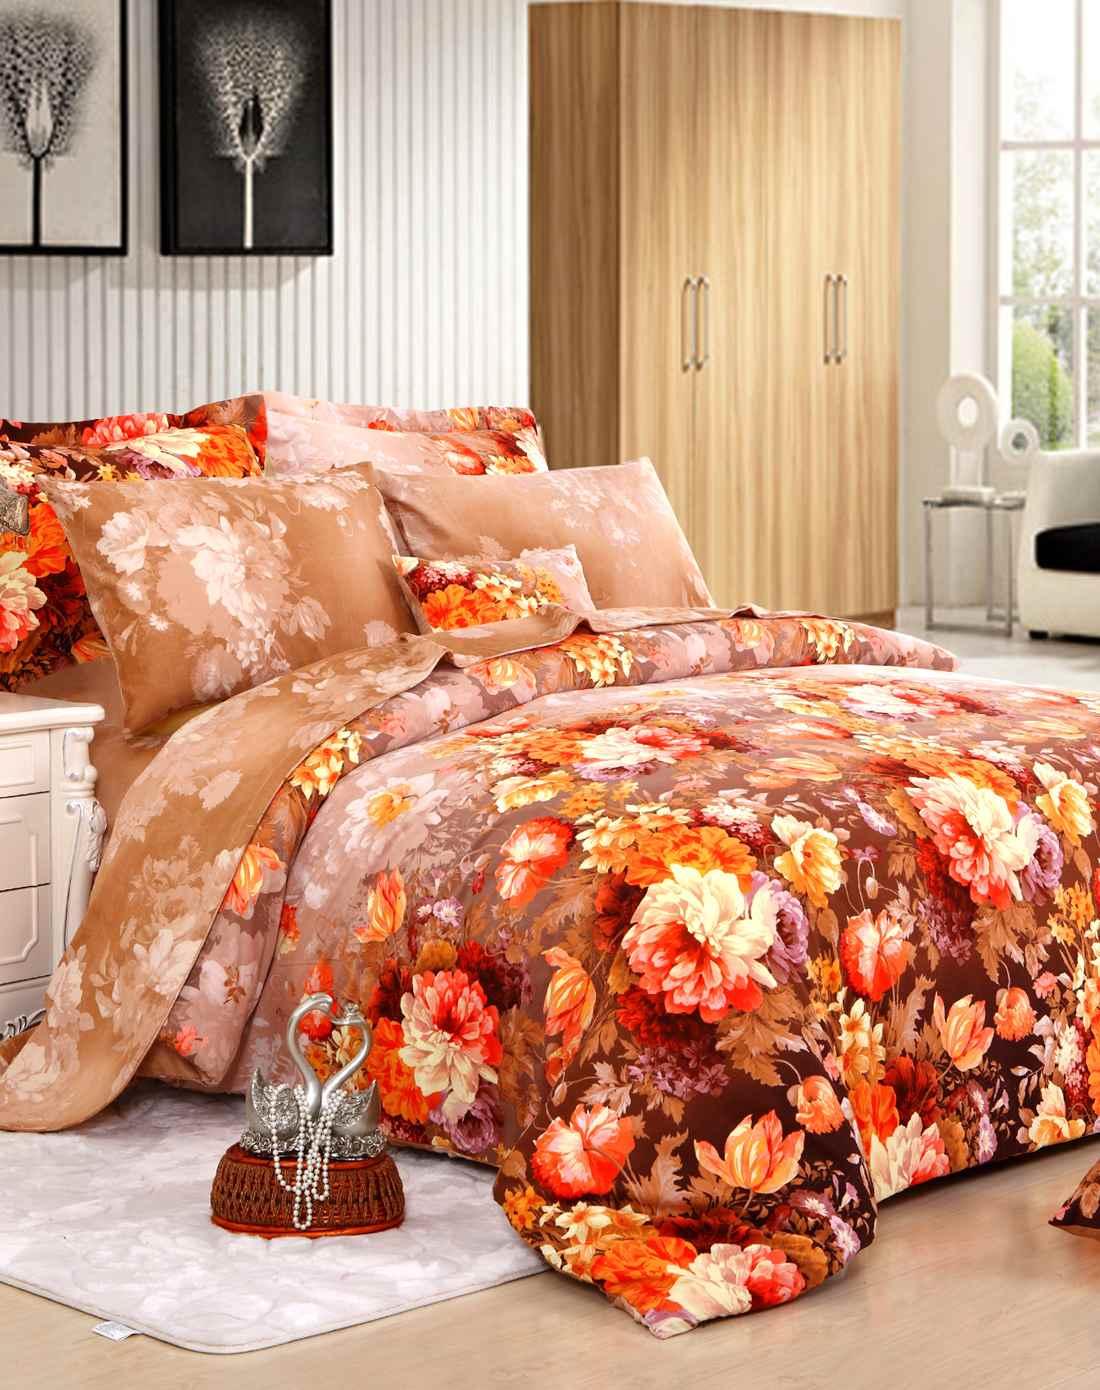 8m床全棉磨毛四件套-凡尔赛花园